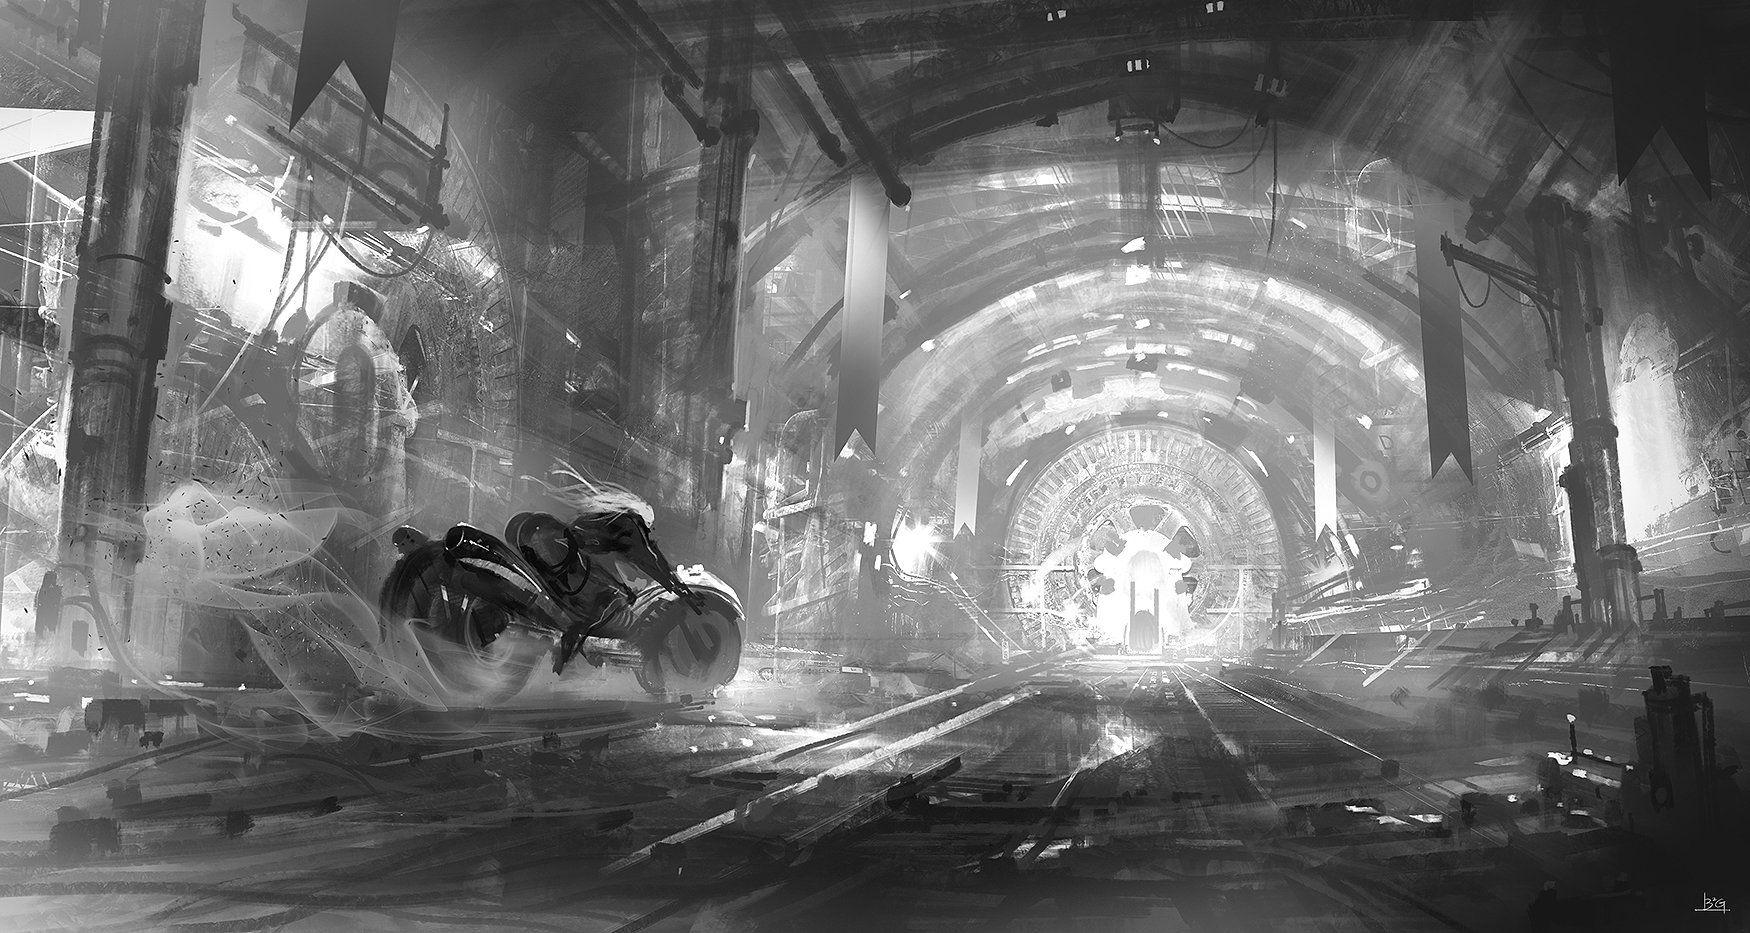 ArtStation - Invade, Gao ZhingPing